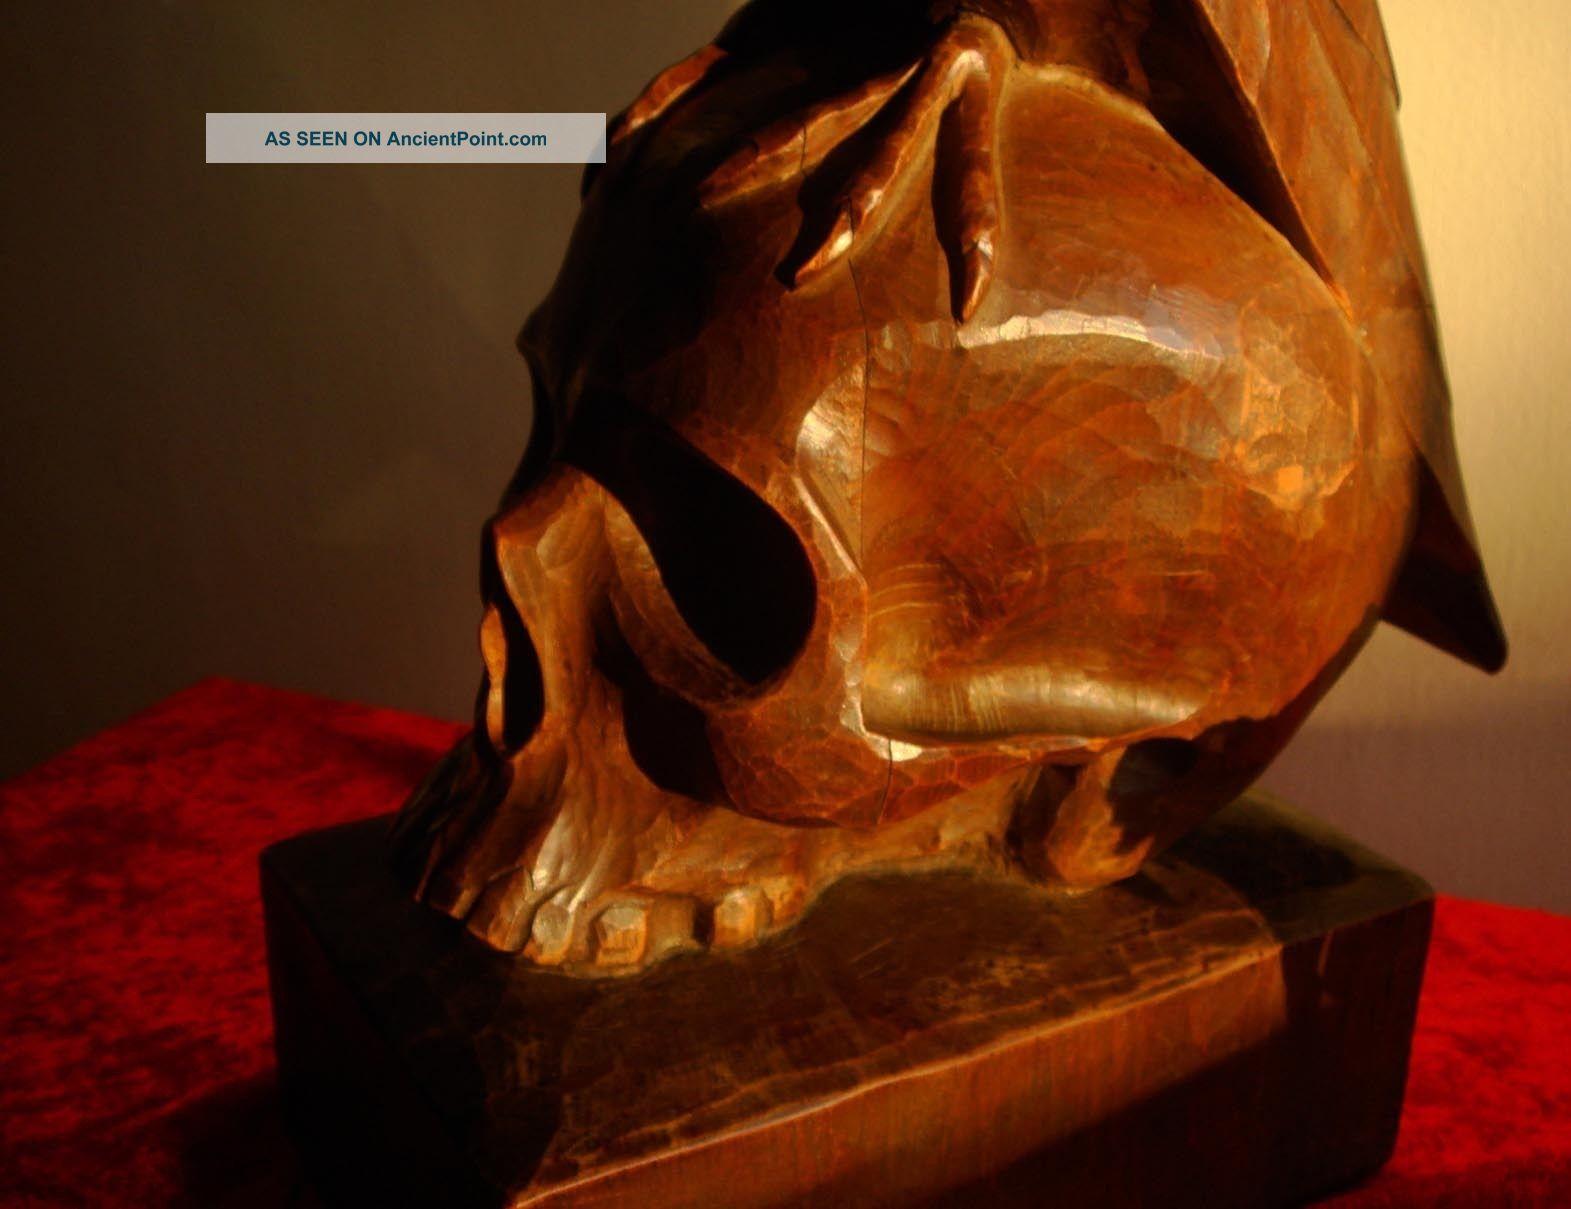 Antique Satanic Wood Carving Sculpture Occult Statue Devil Crow Skull Bronze Carved Figures photo